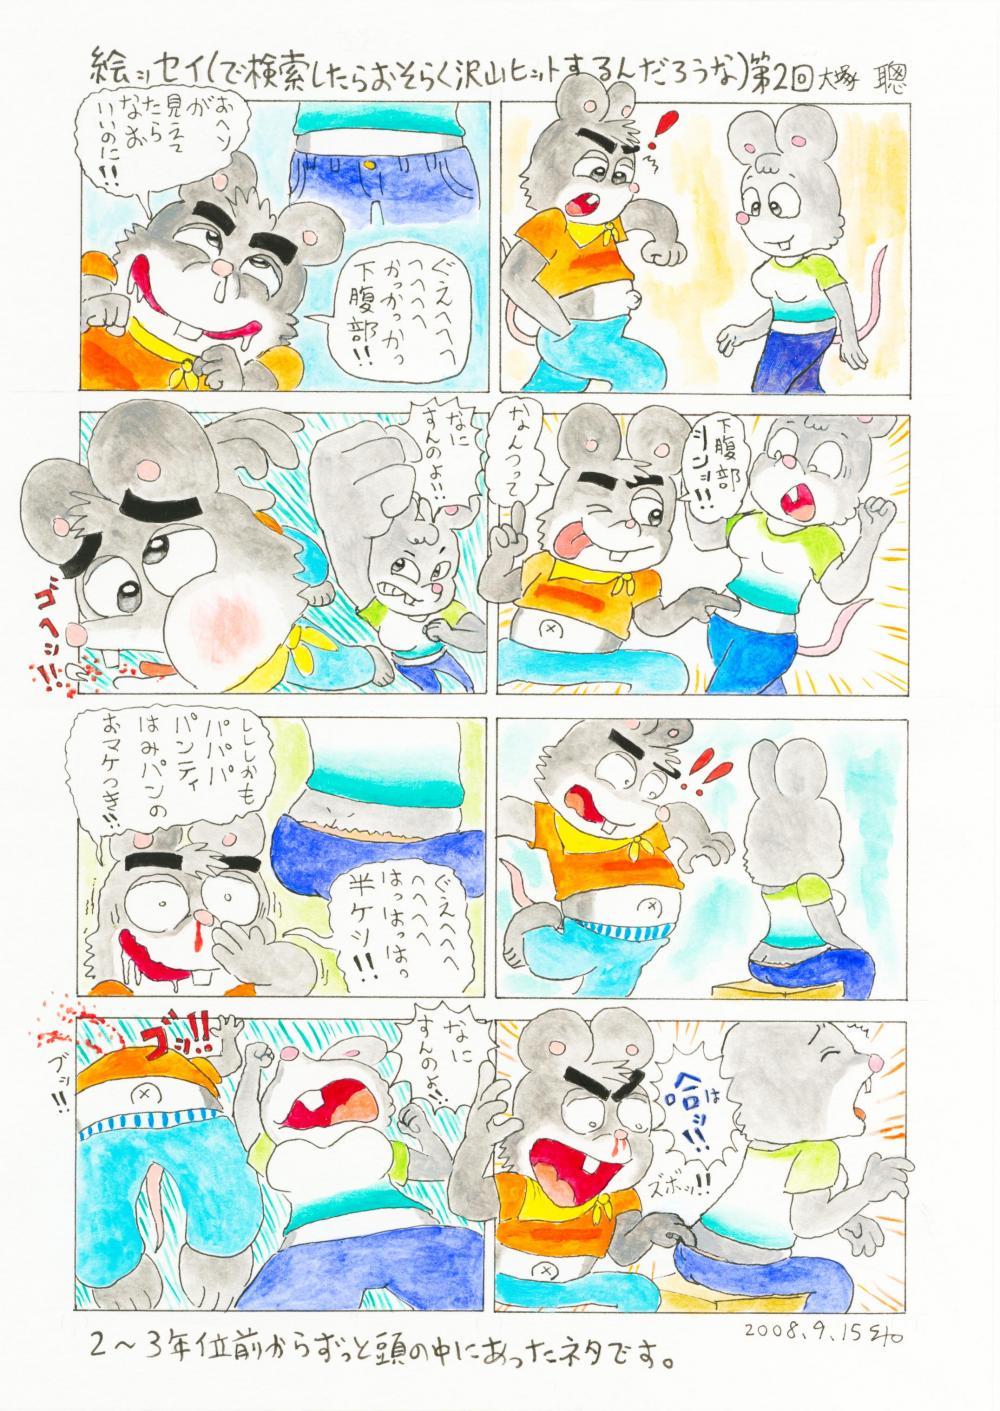 絵随筆第2番(2008.9.15)